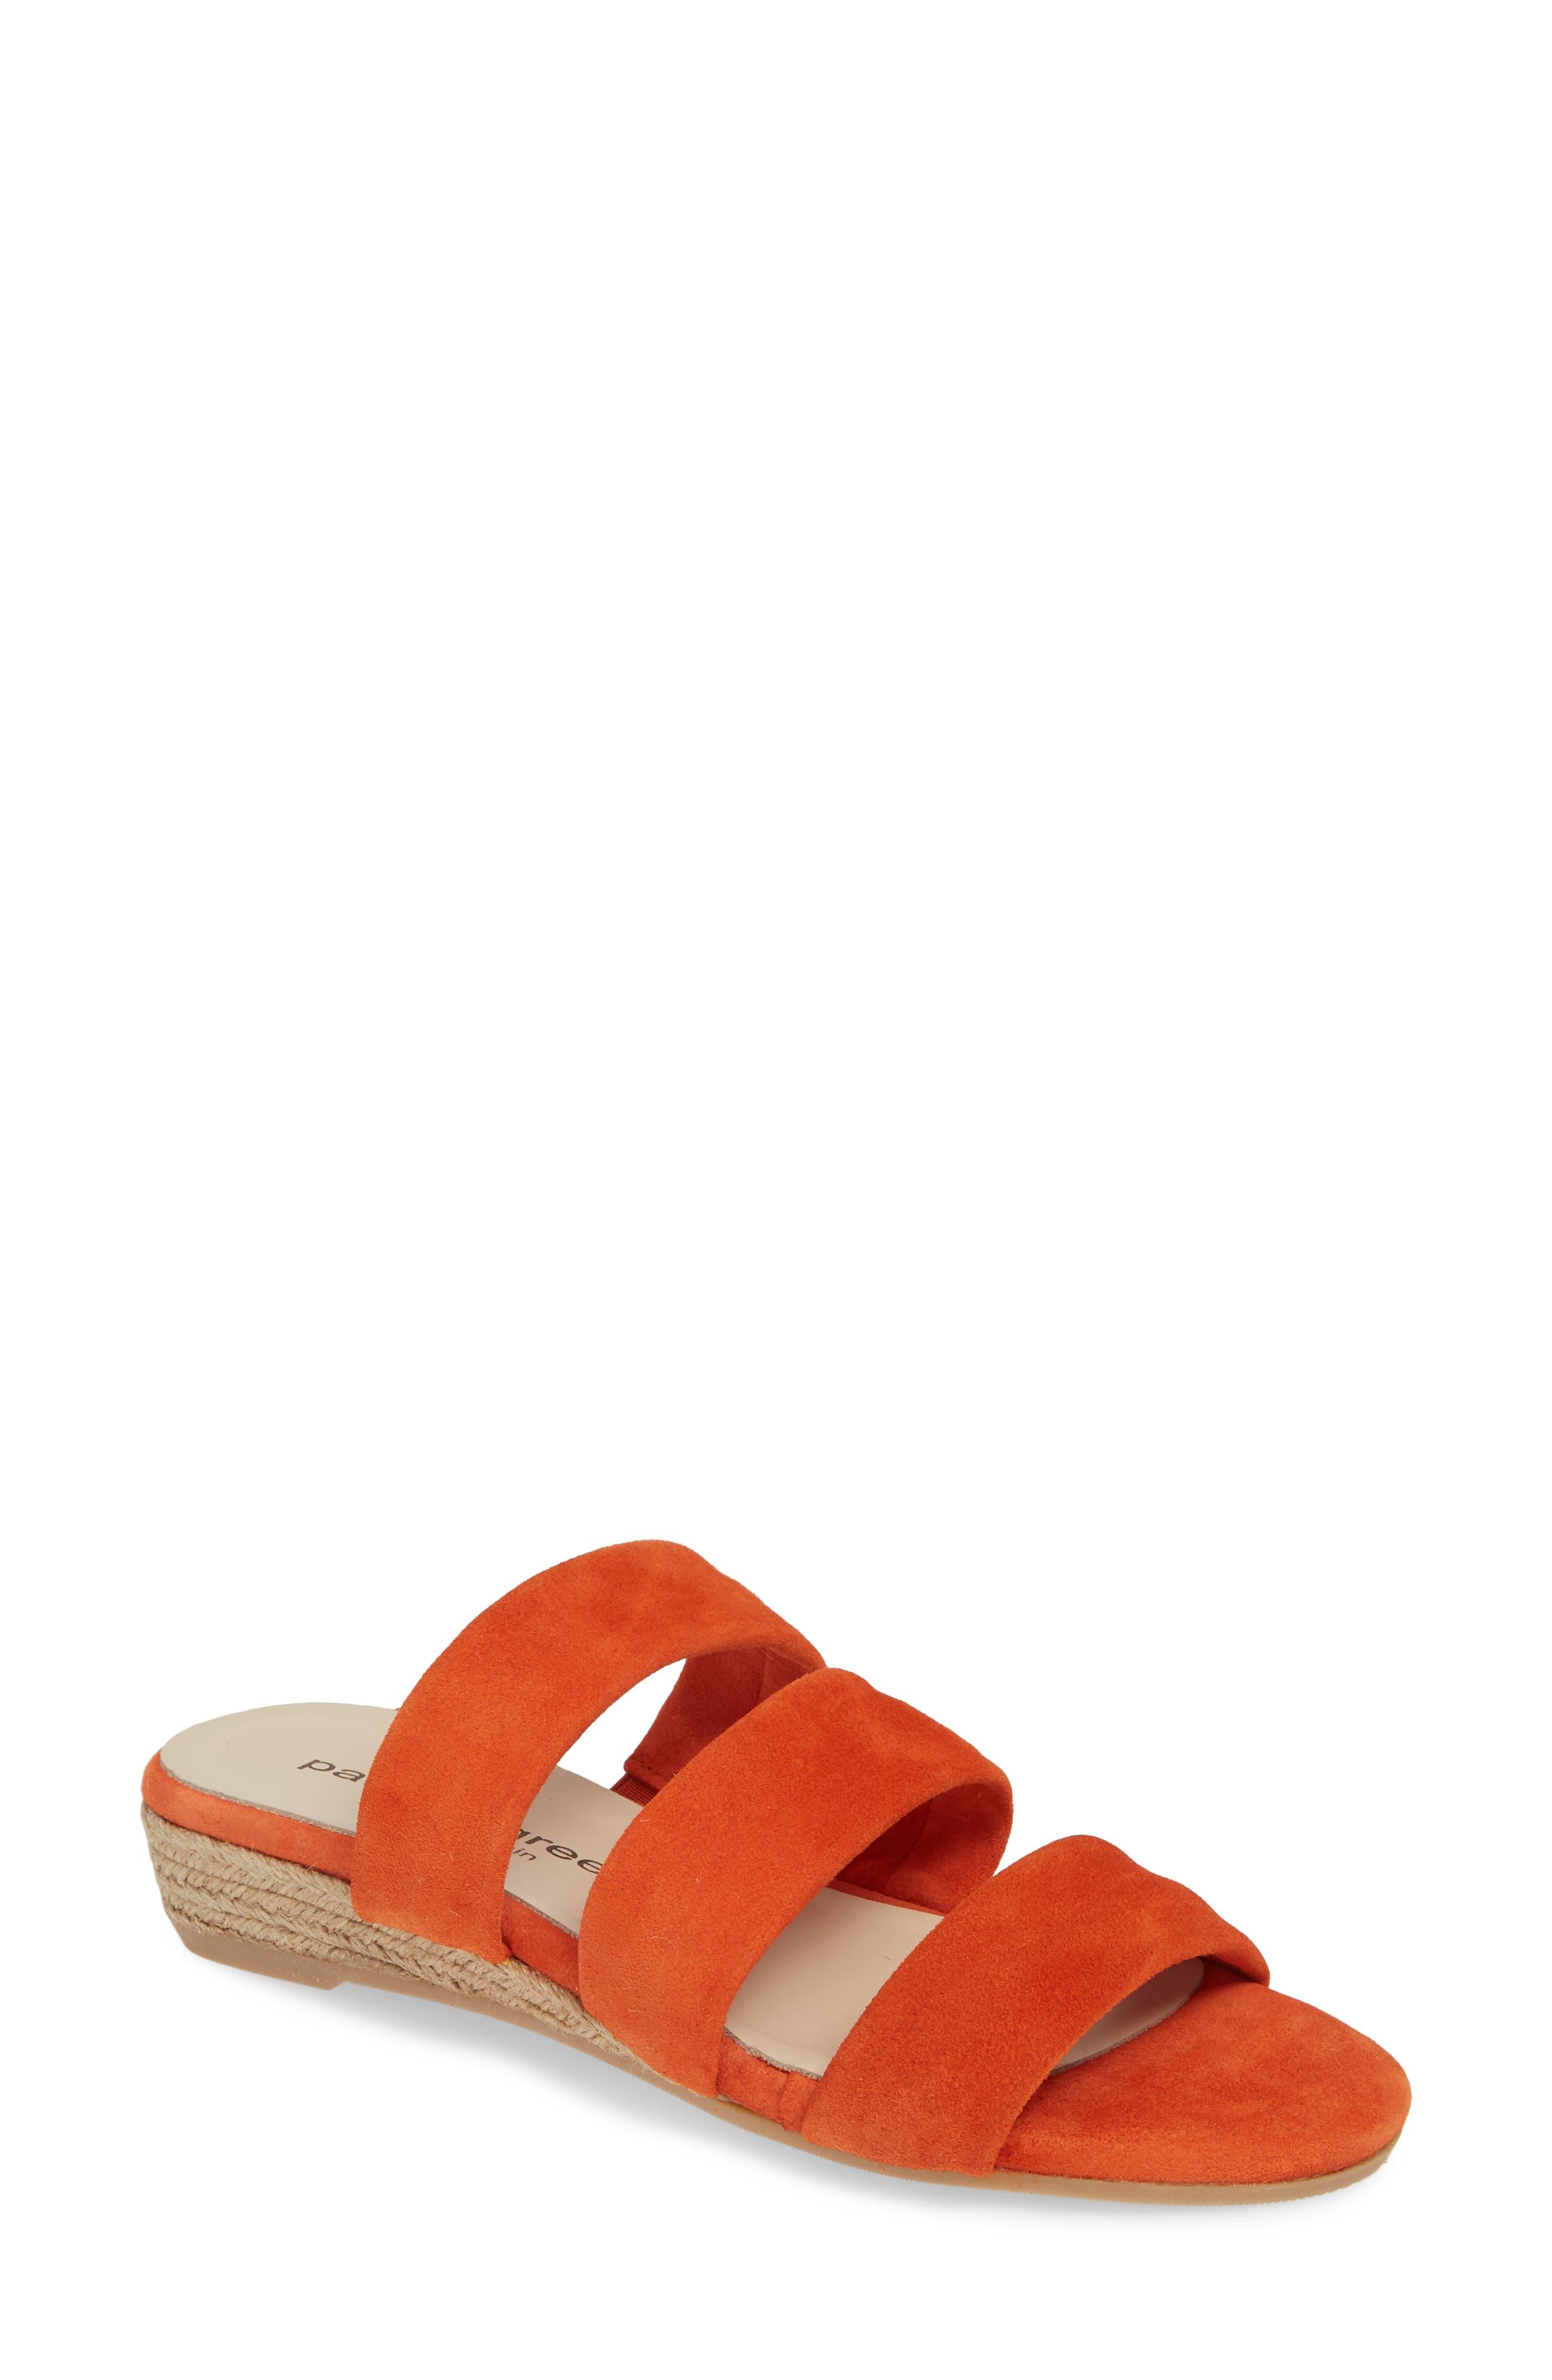 Patricia Green Josee Slide Sandal, Orange